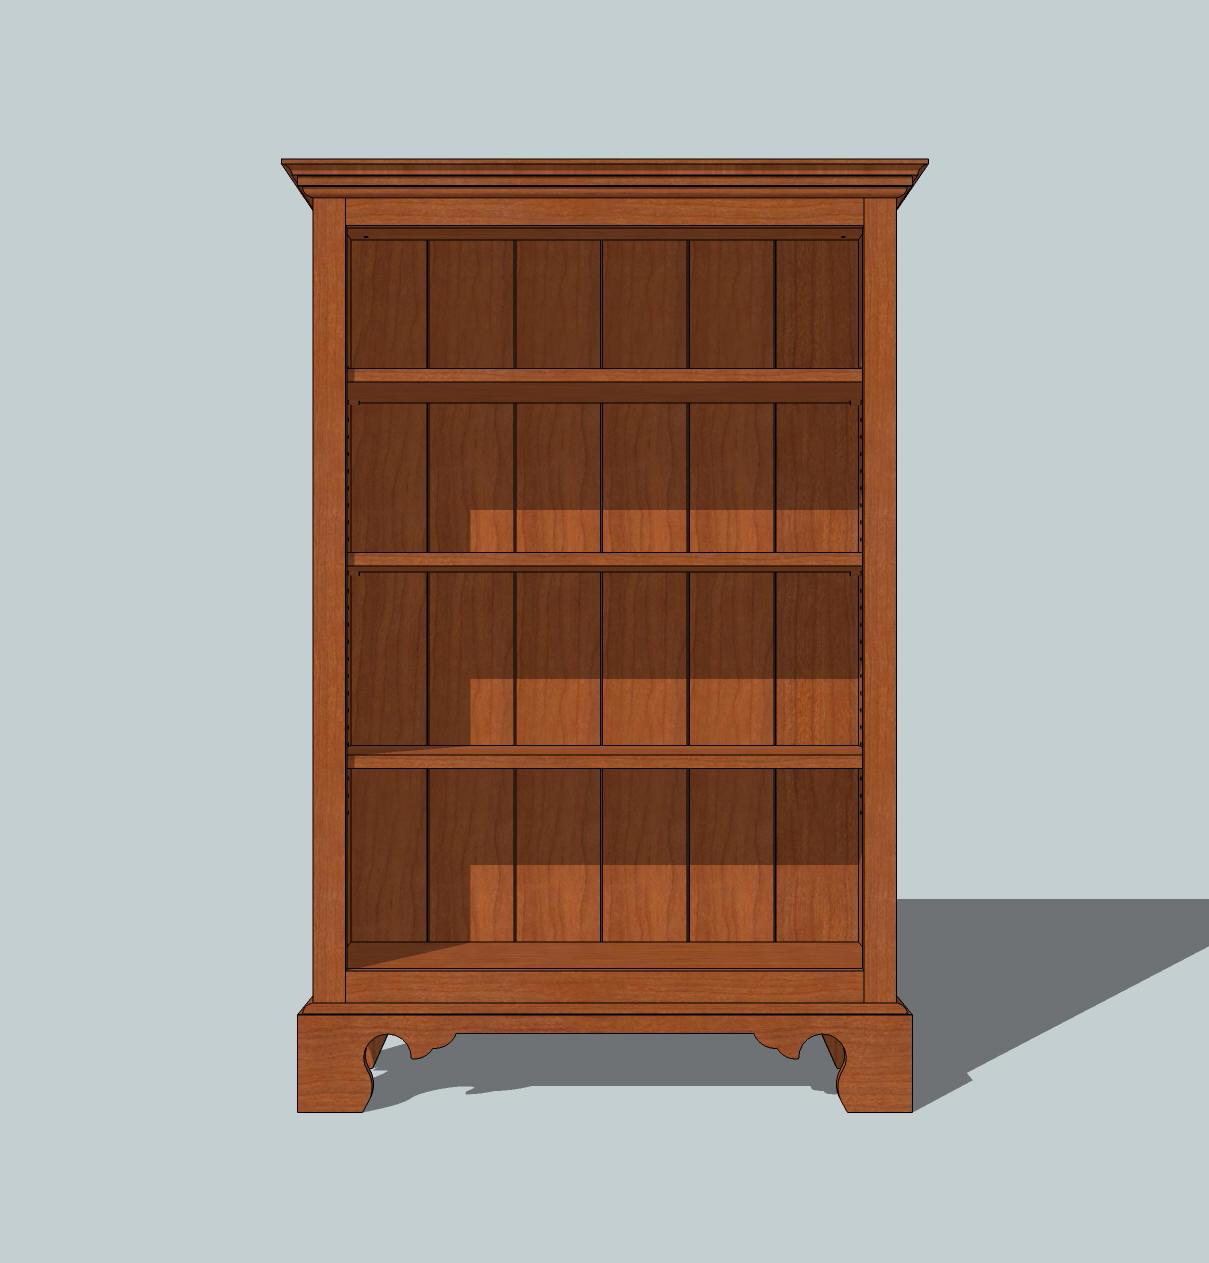 fine woodworking best workbenches pdf